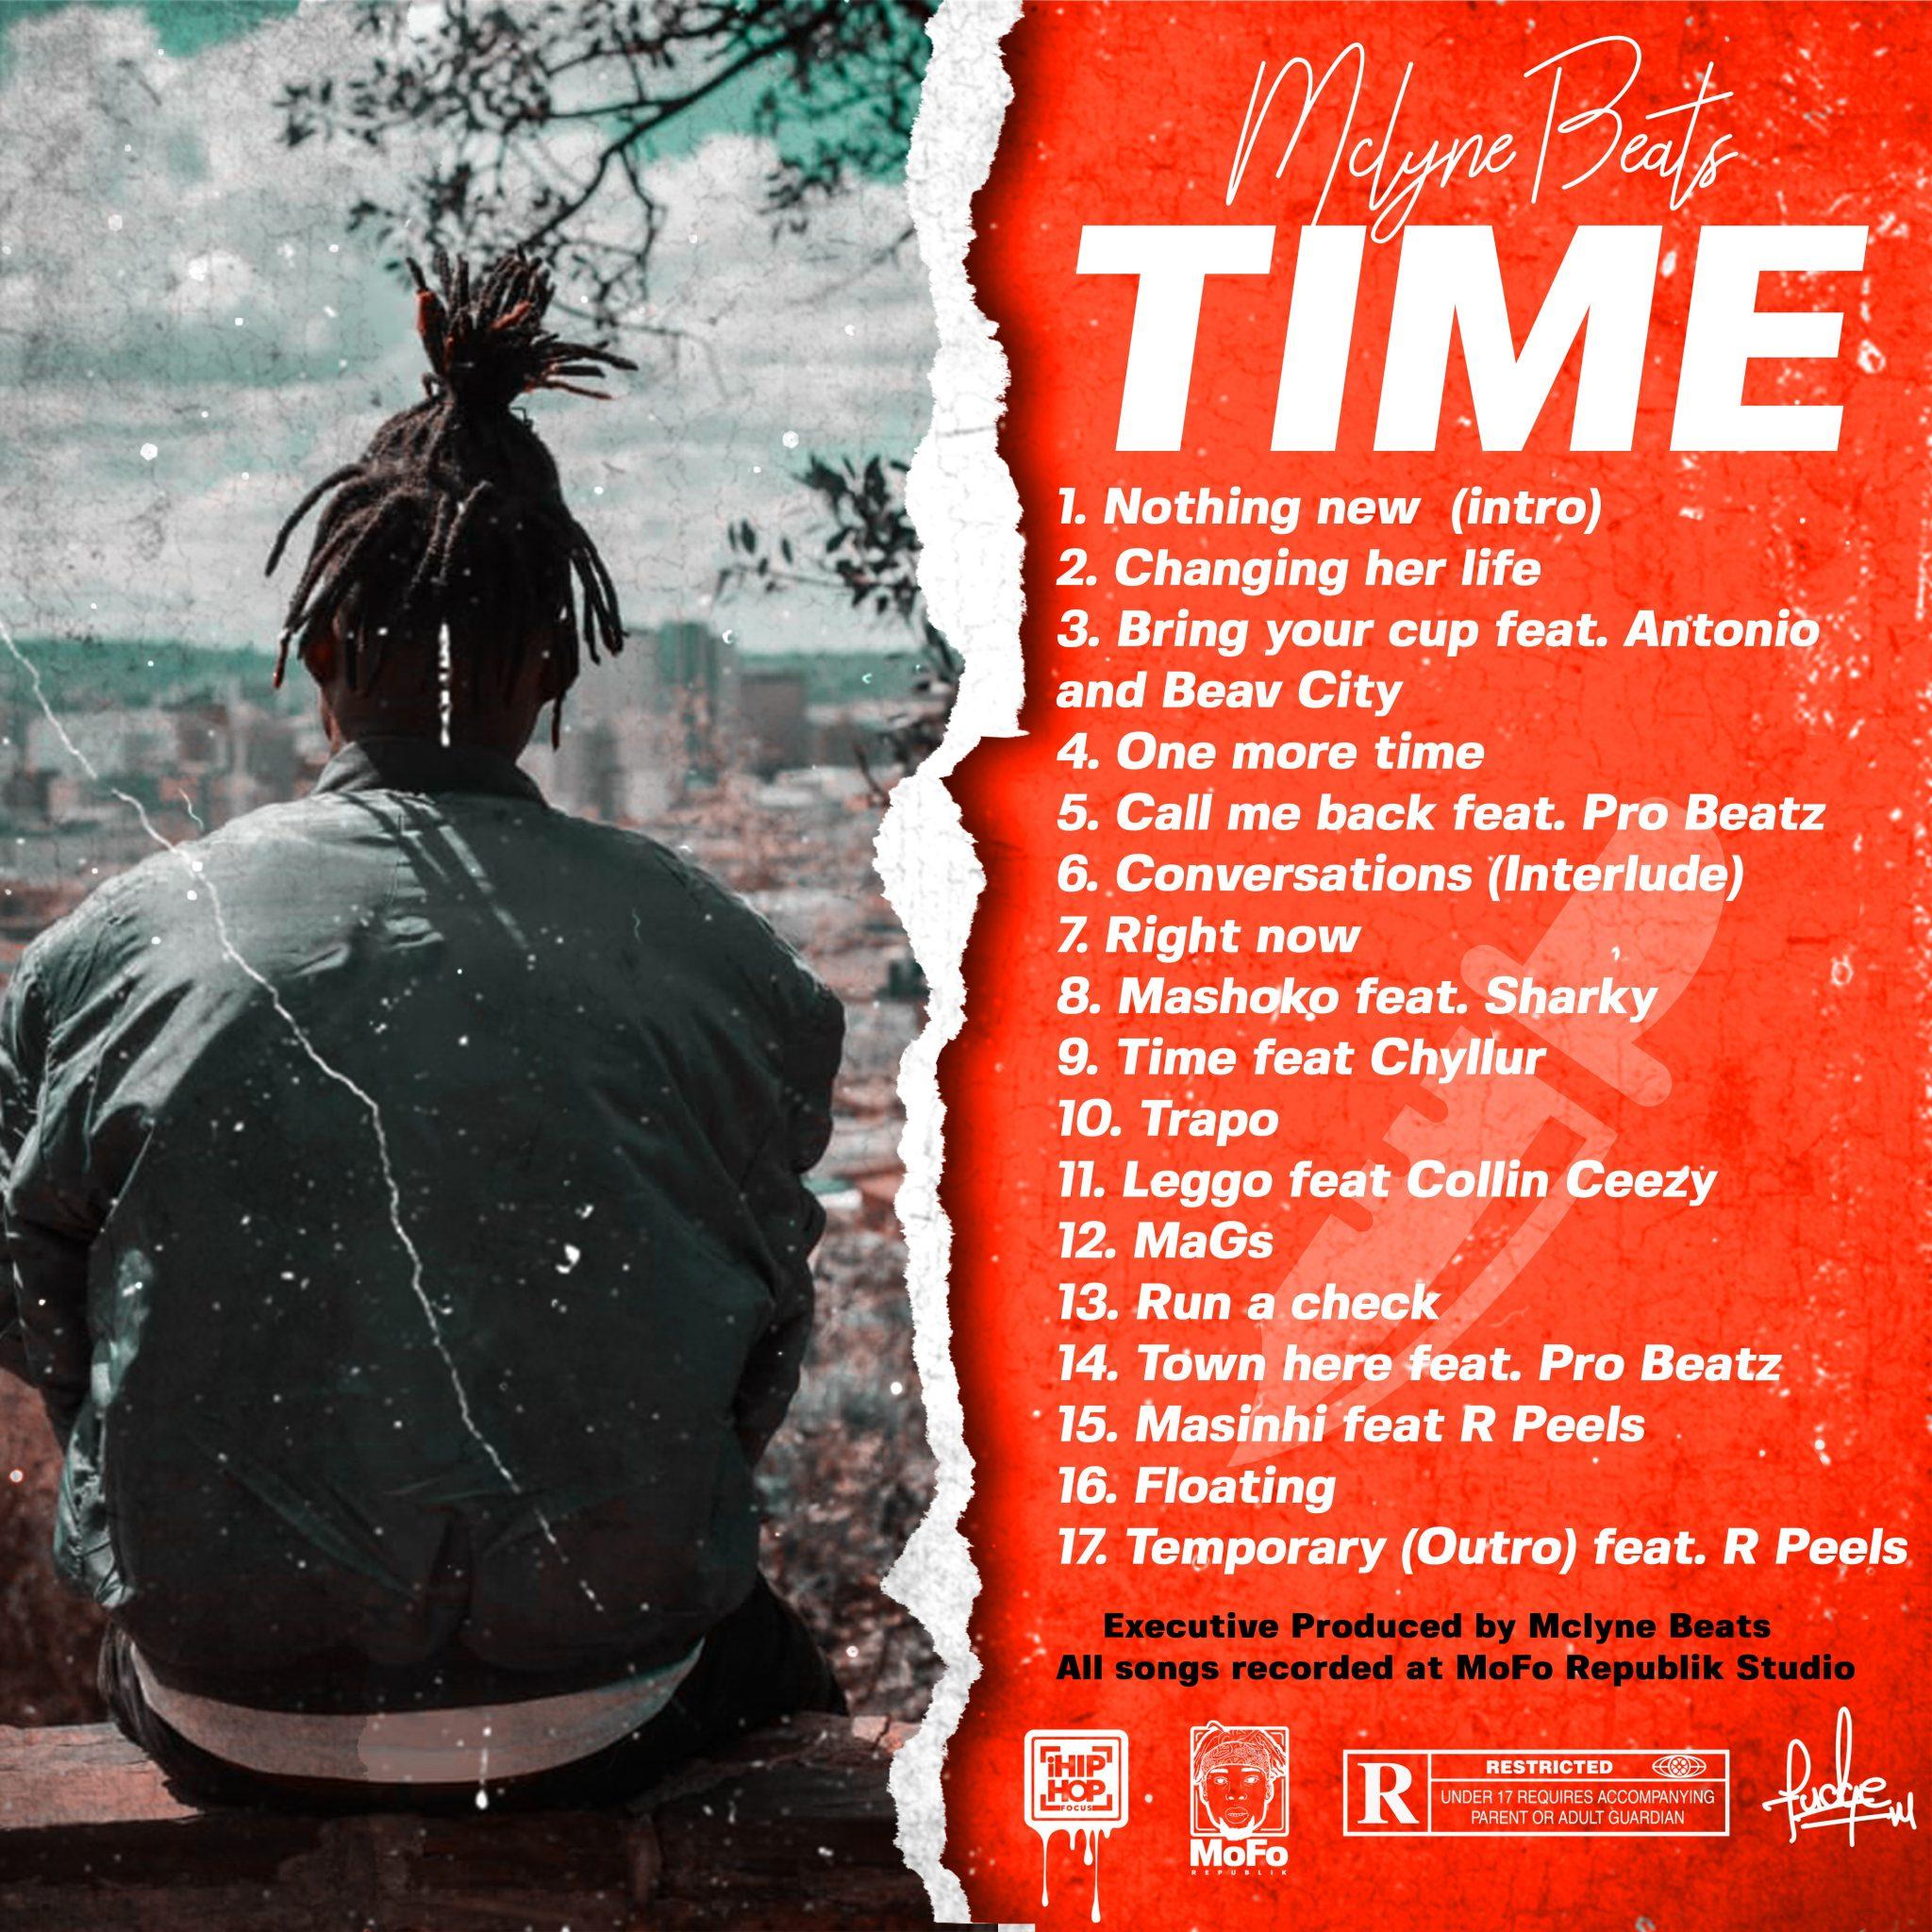 Mclyne beatsT I M E tracklist